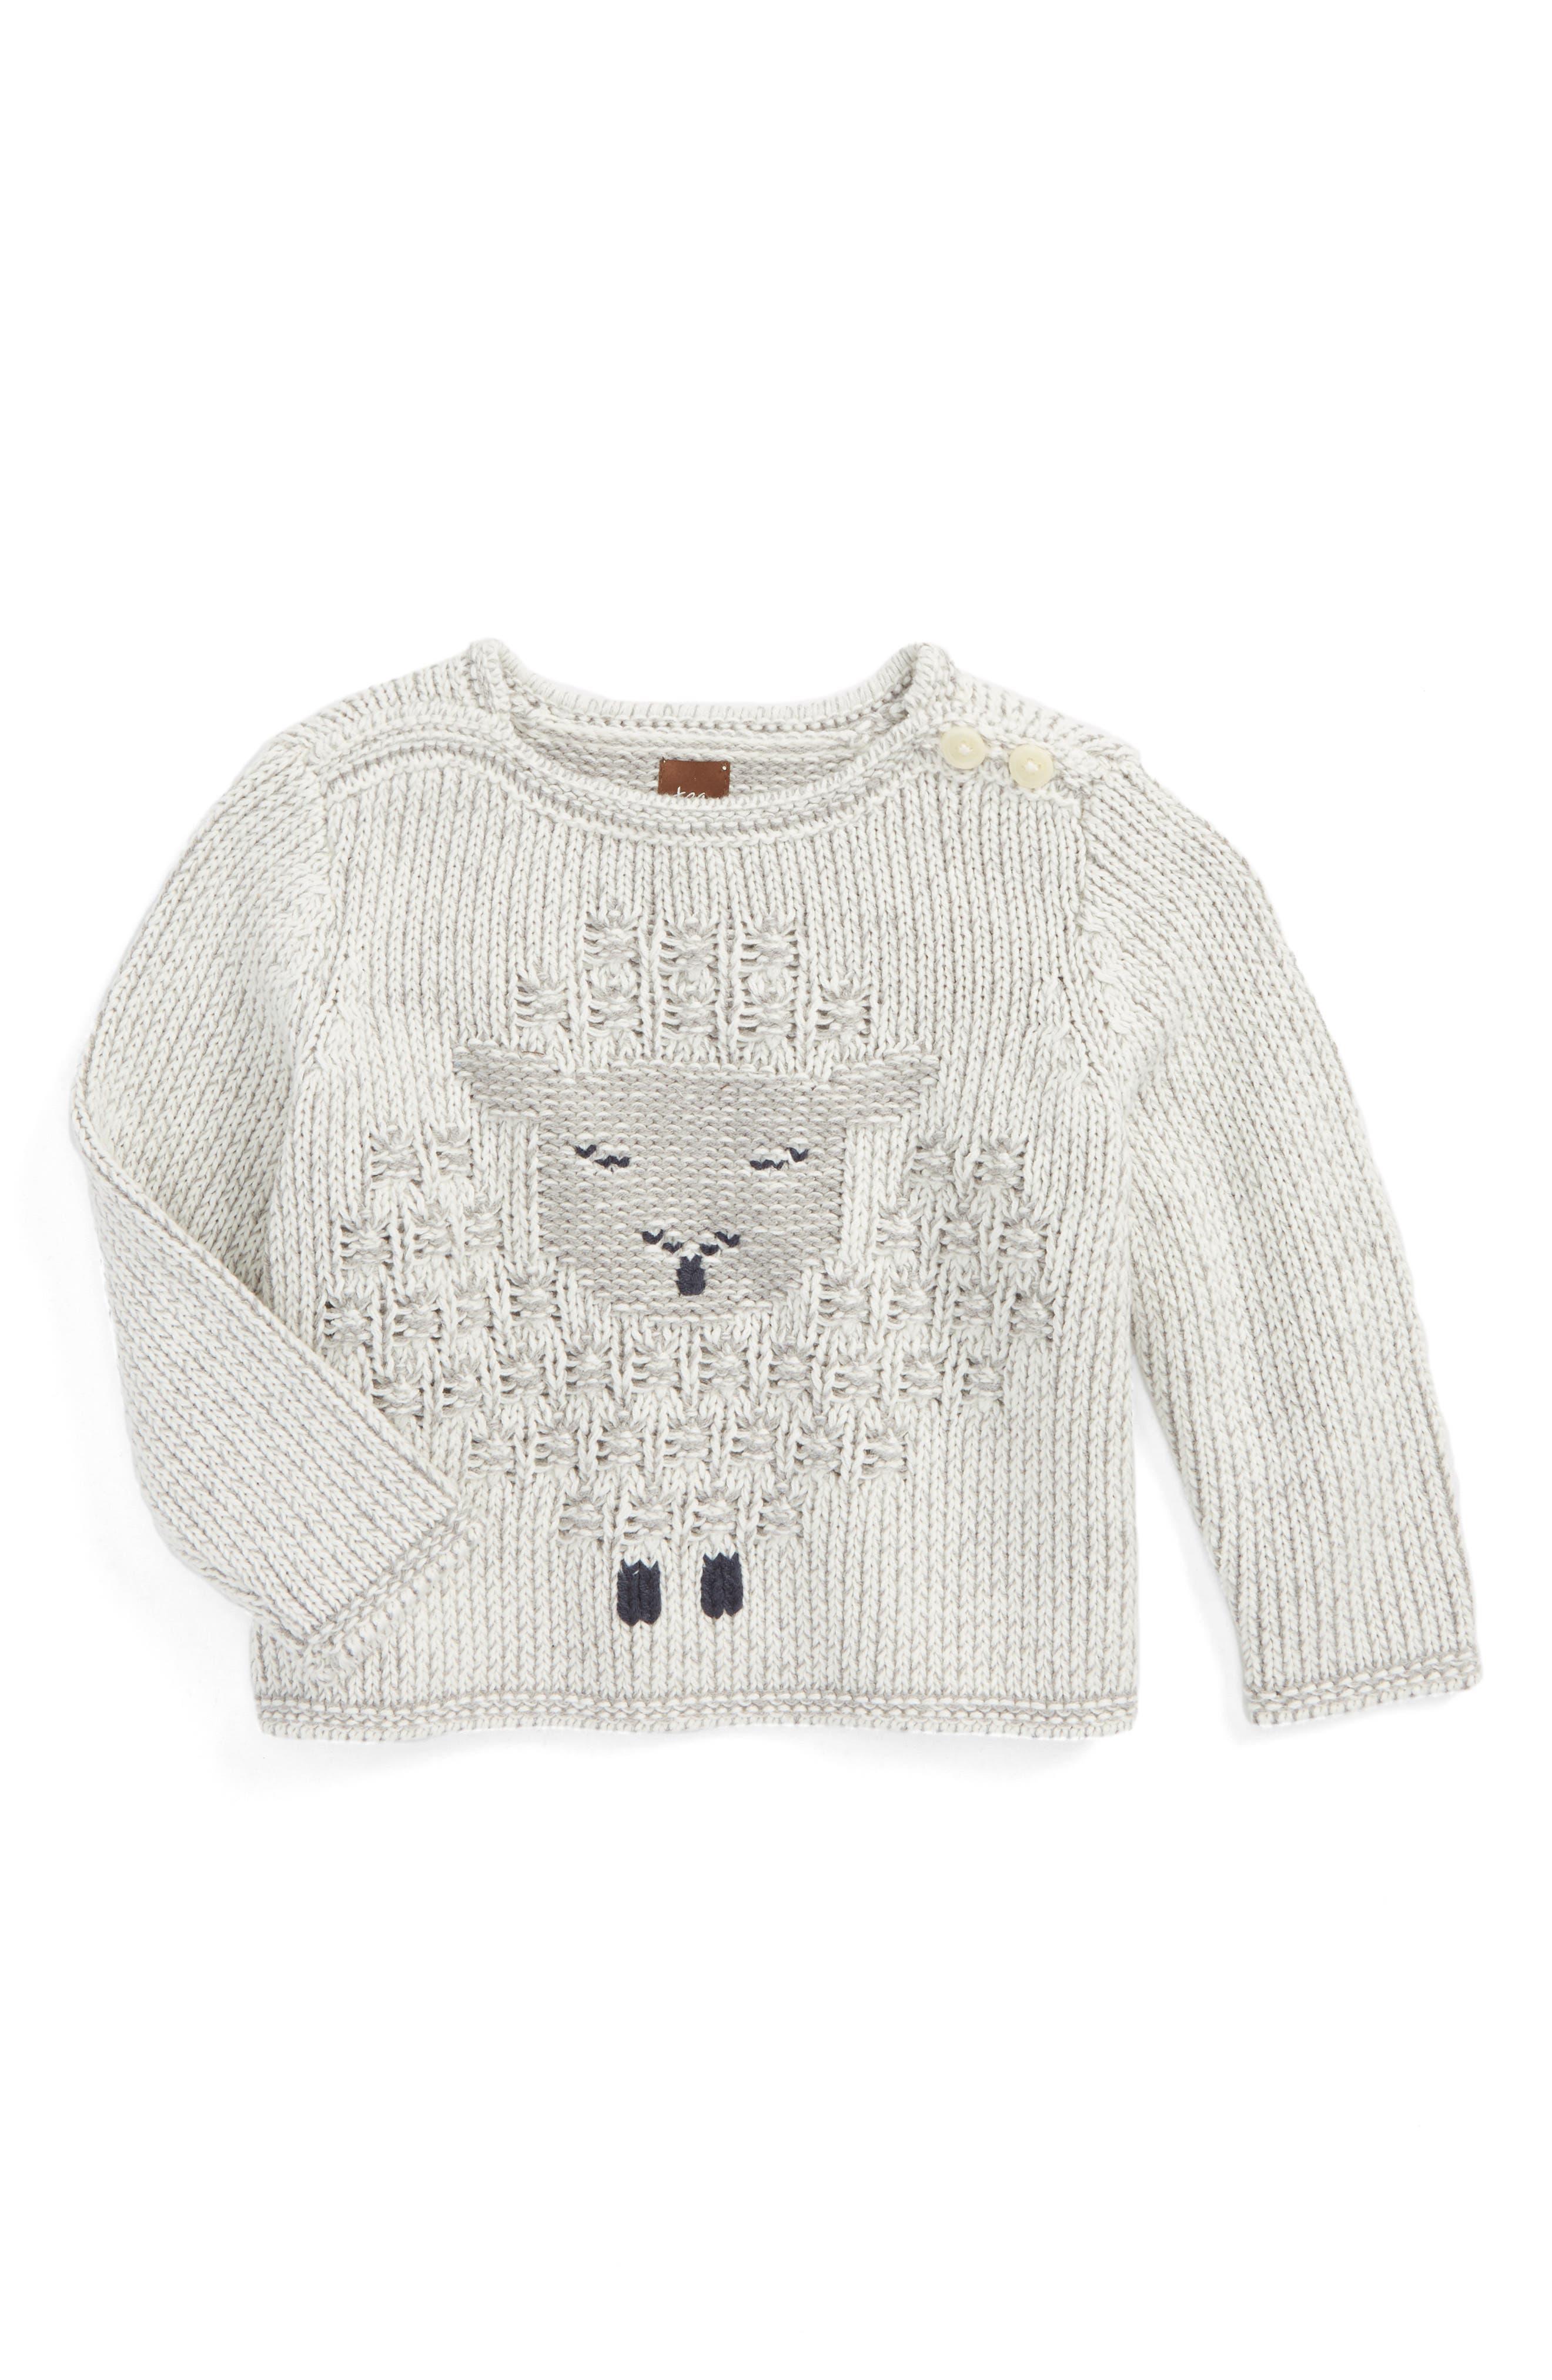 Uan Sweater,                             Main thumbnail 1, color,                             Chalk